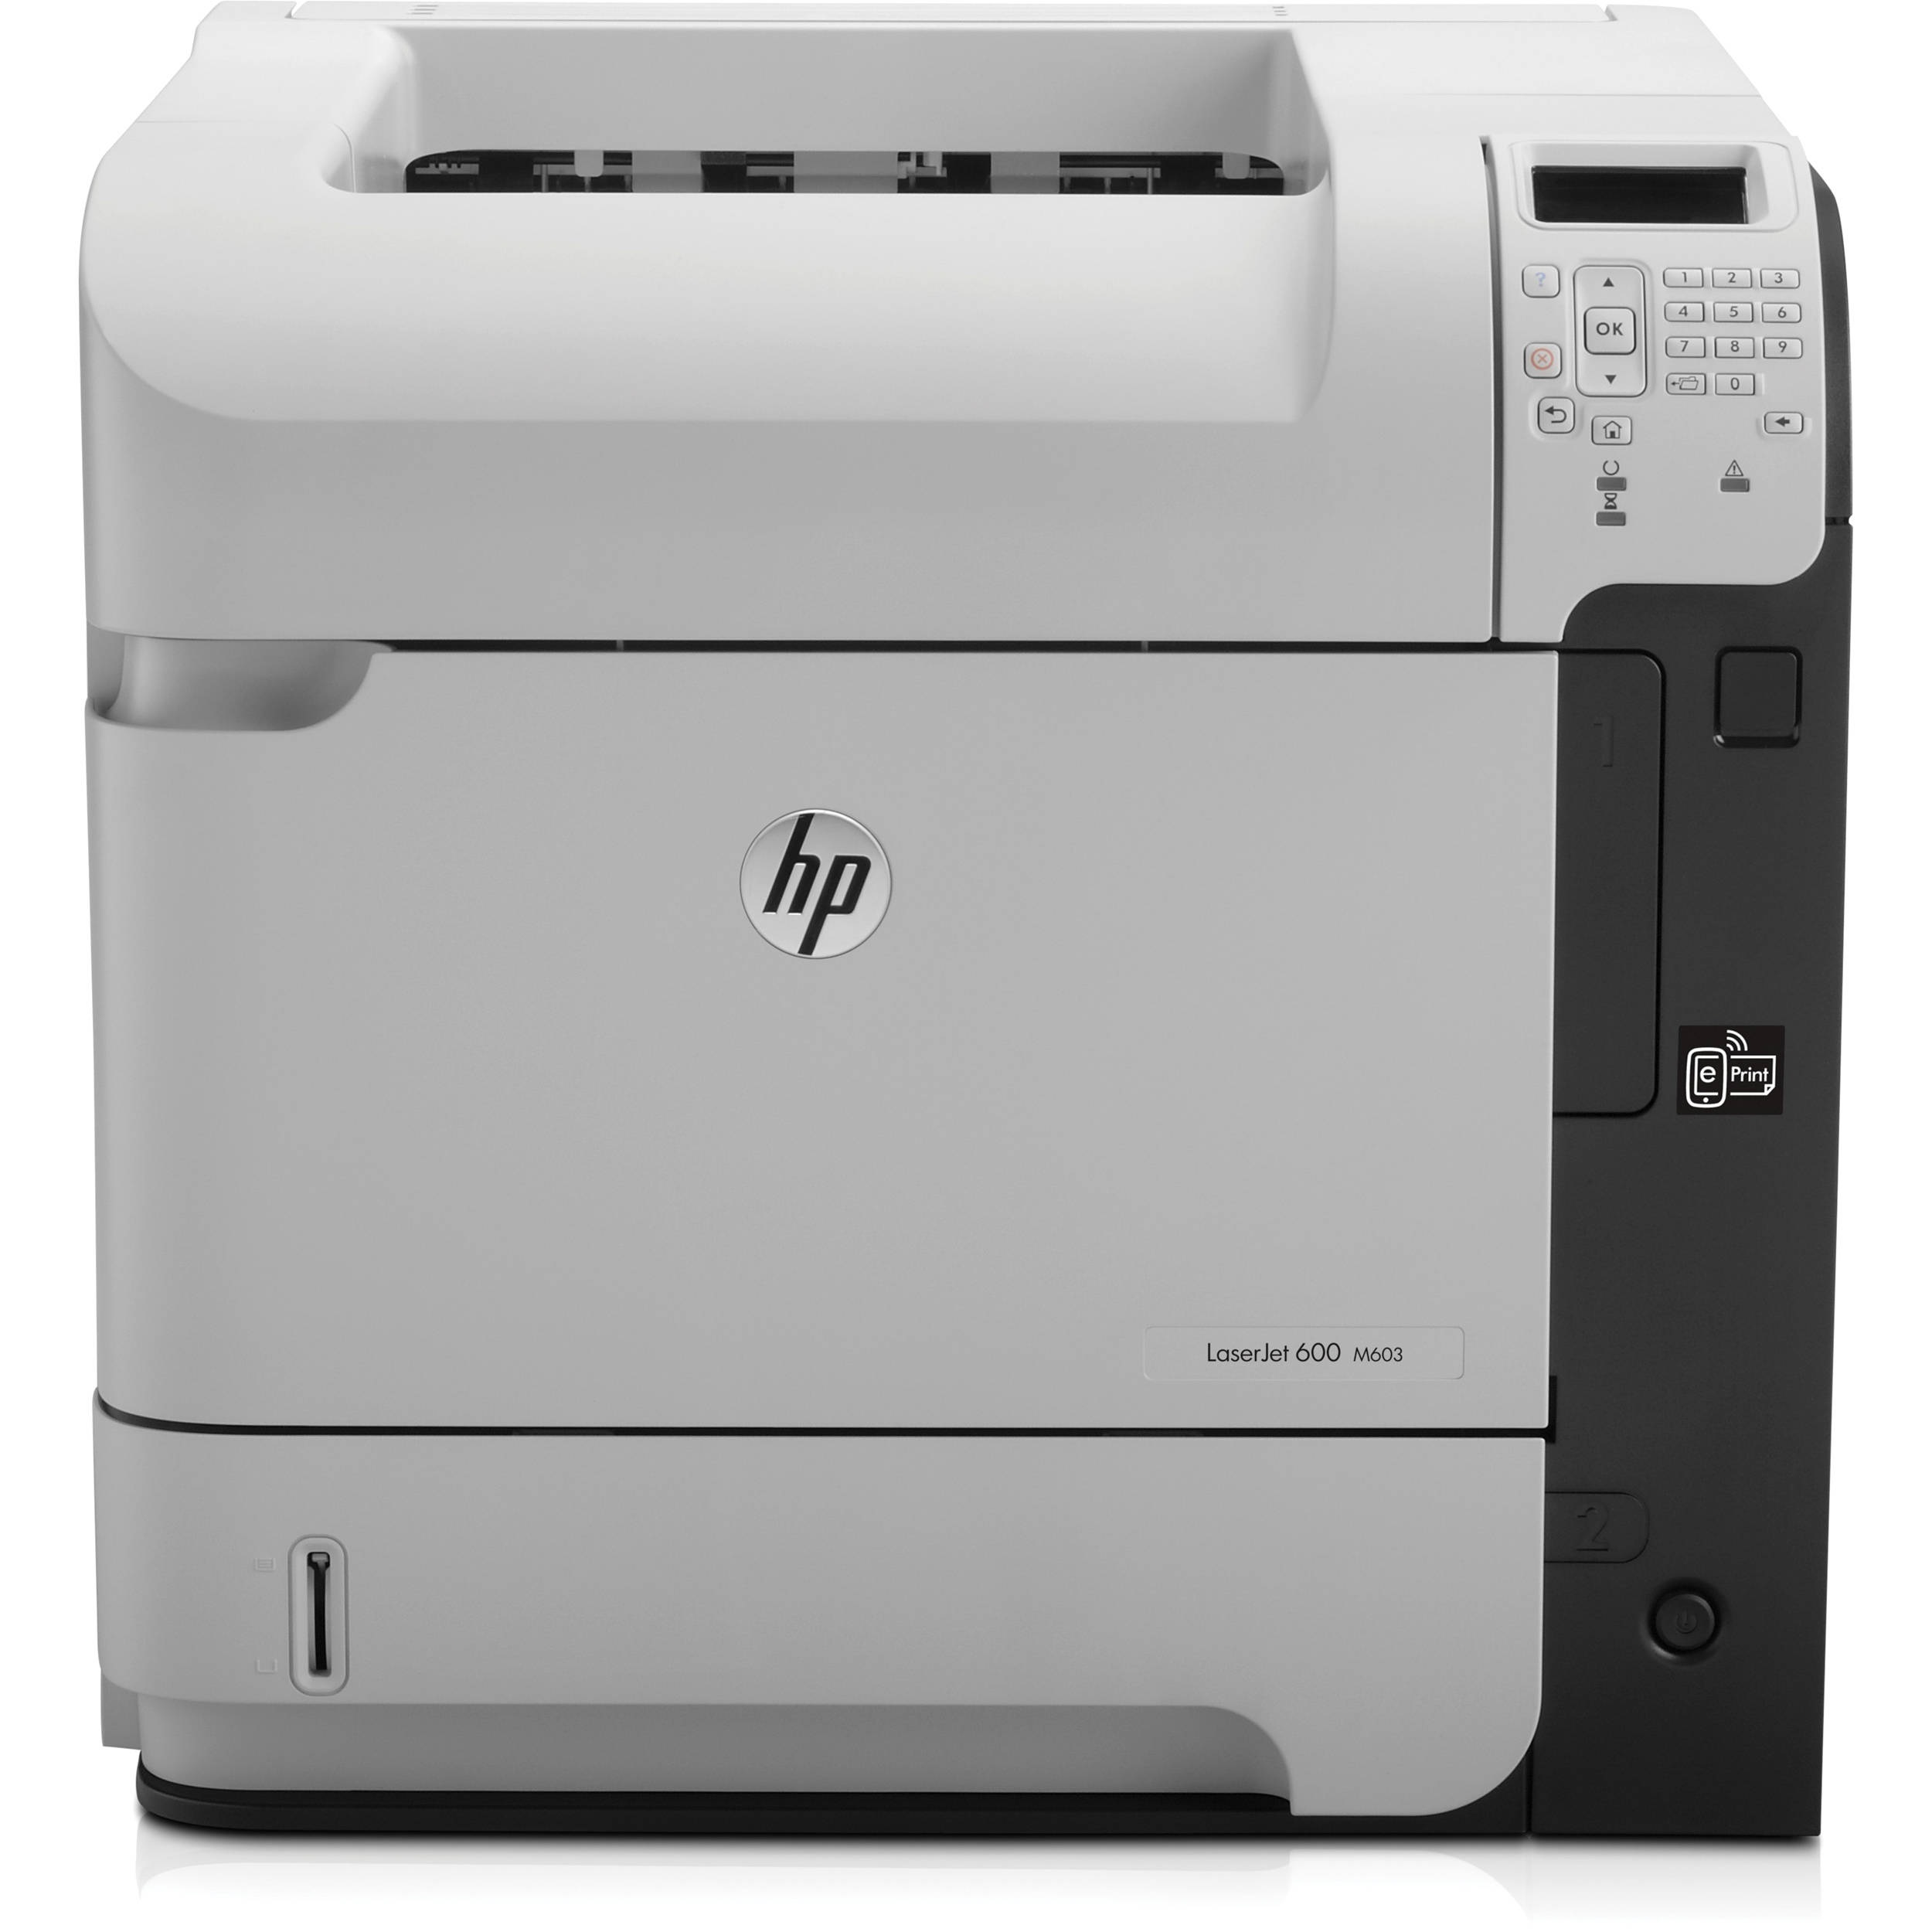 HP LaserJet Enterprise 600 M603